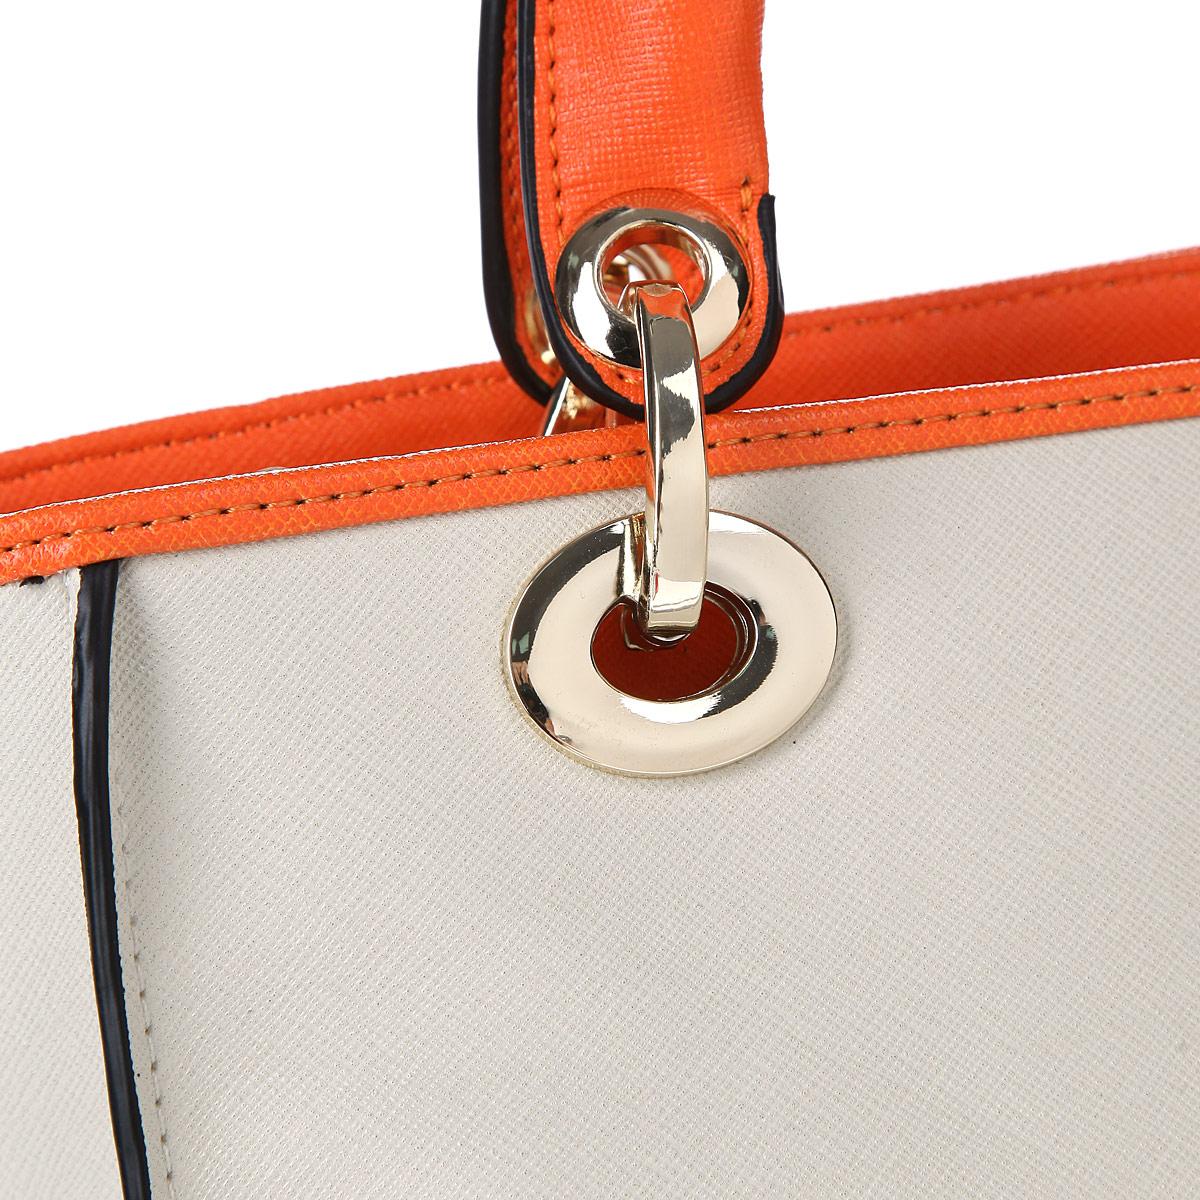 Сумка женская Leighton, цвет: молочный, оранжевый. 510254-3769 ( 510254-3769/23/3769/18 бе )